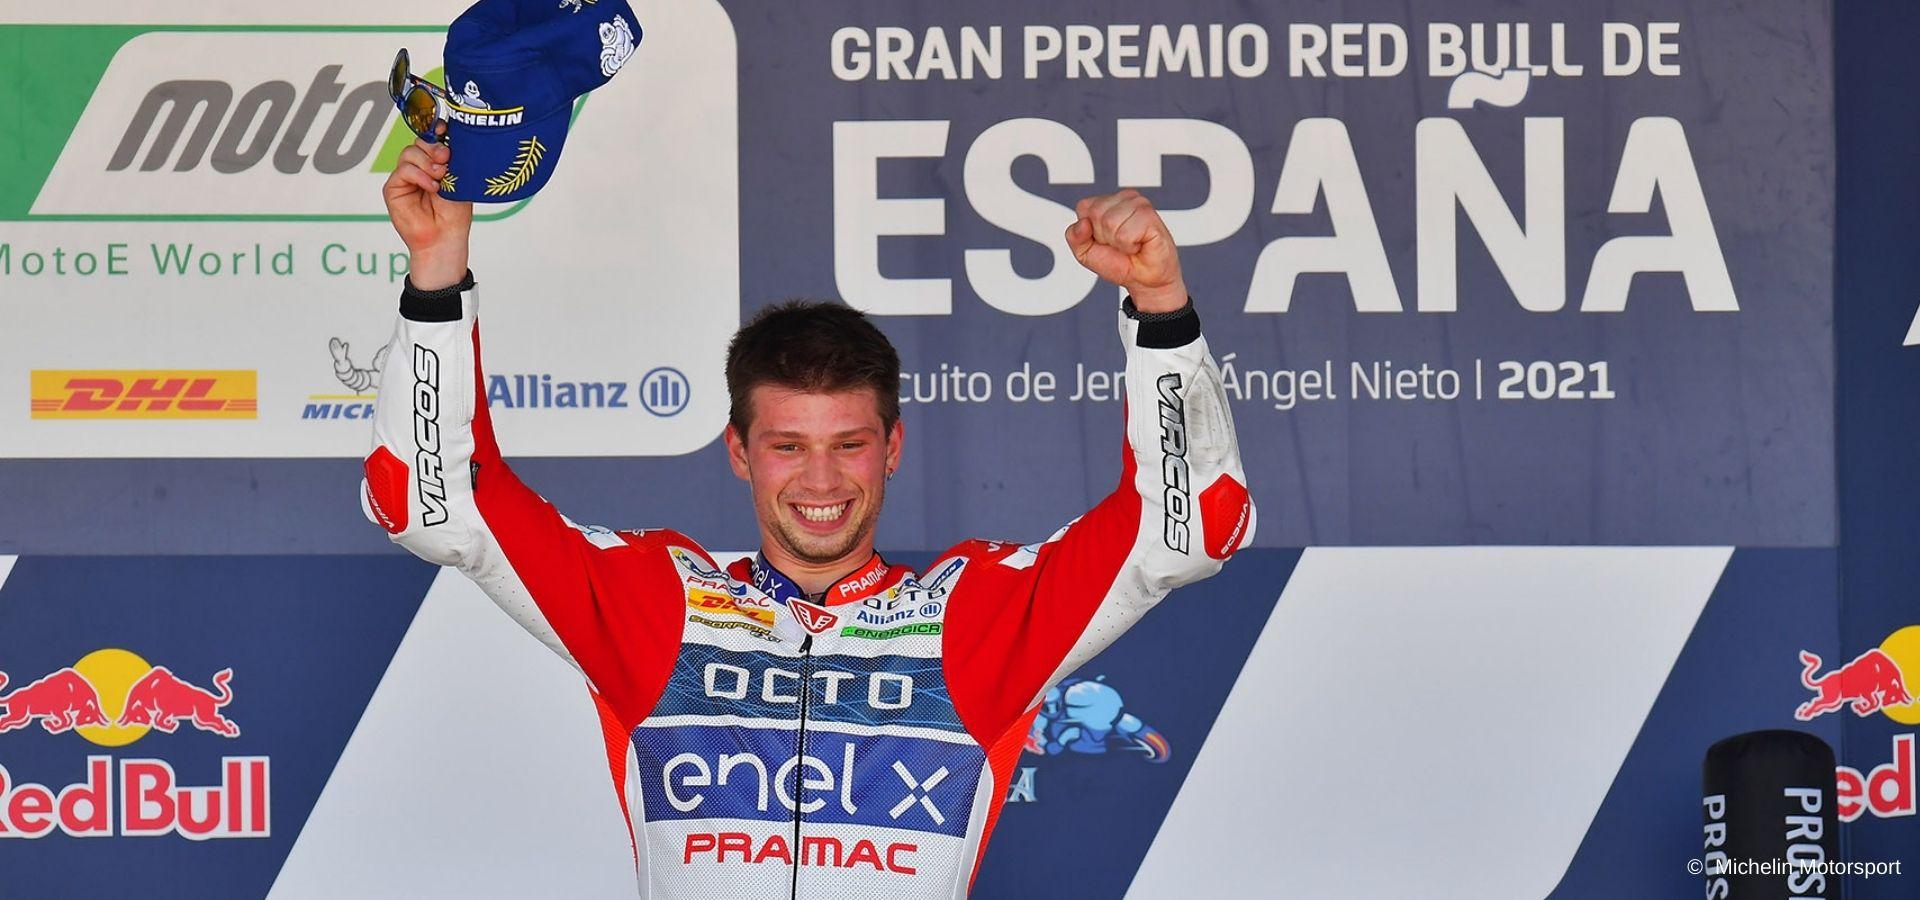 Alessandro Zaccone: from the scary crash in Misano to Moto2